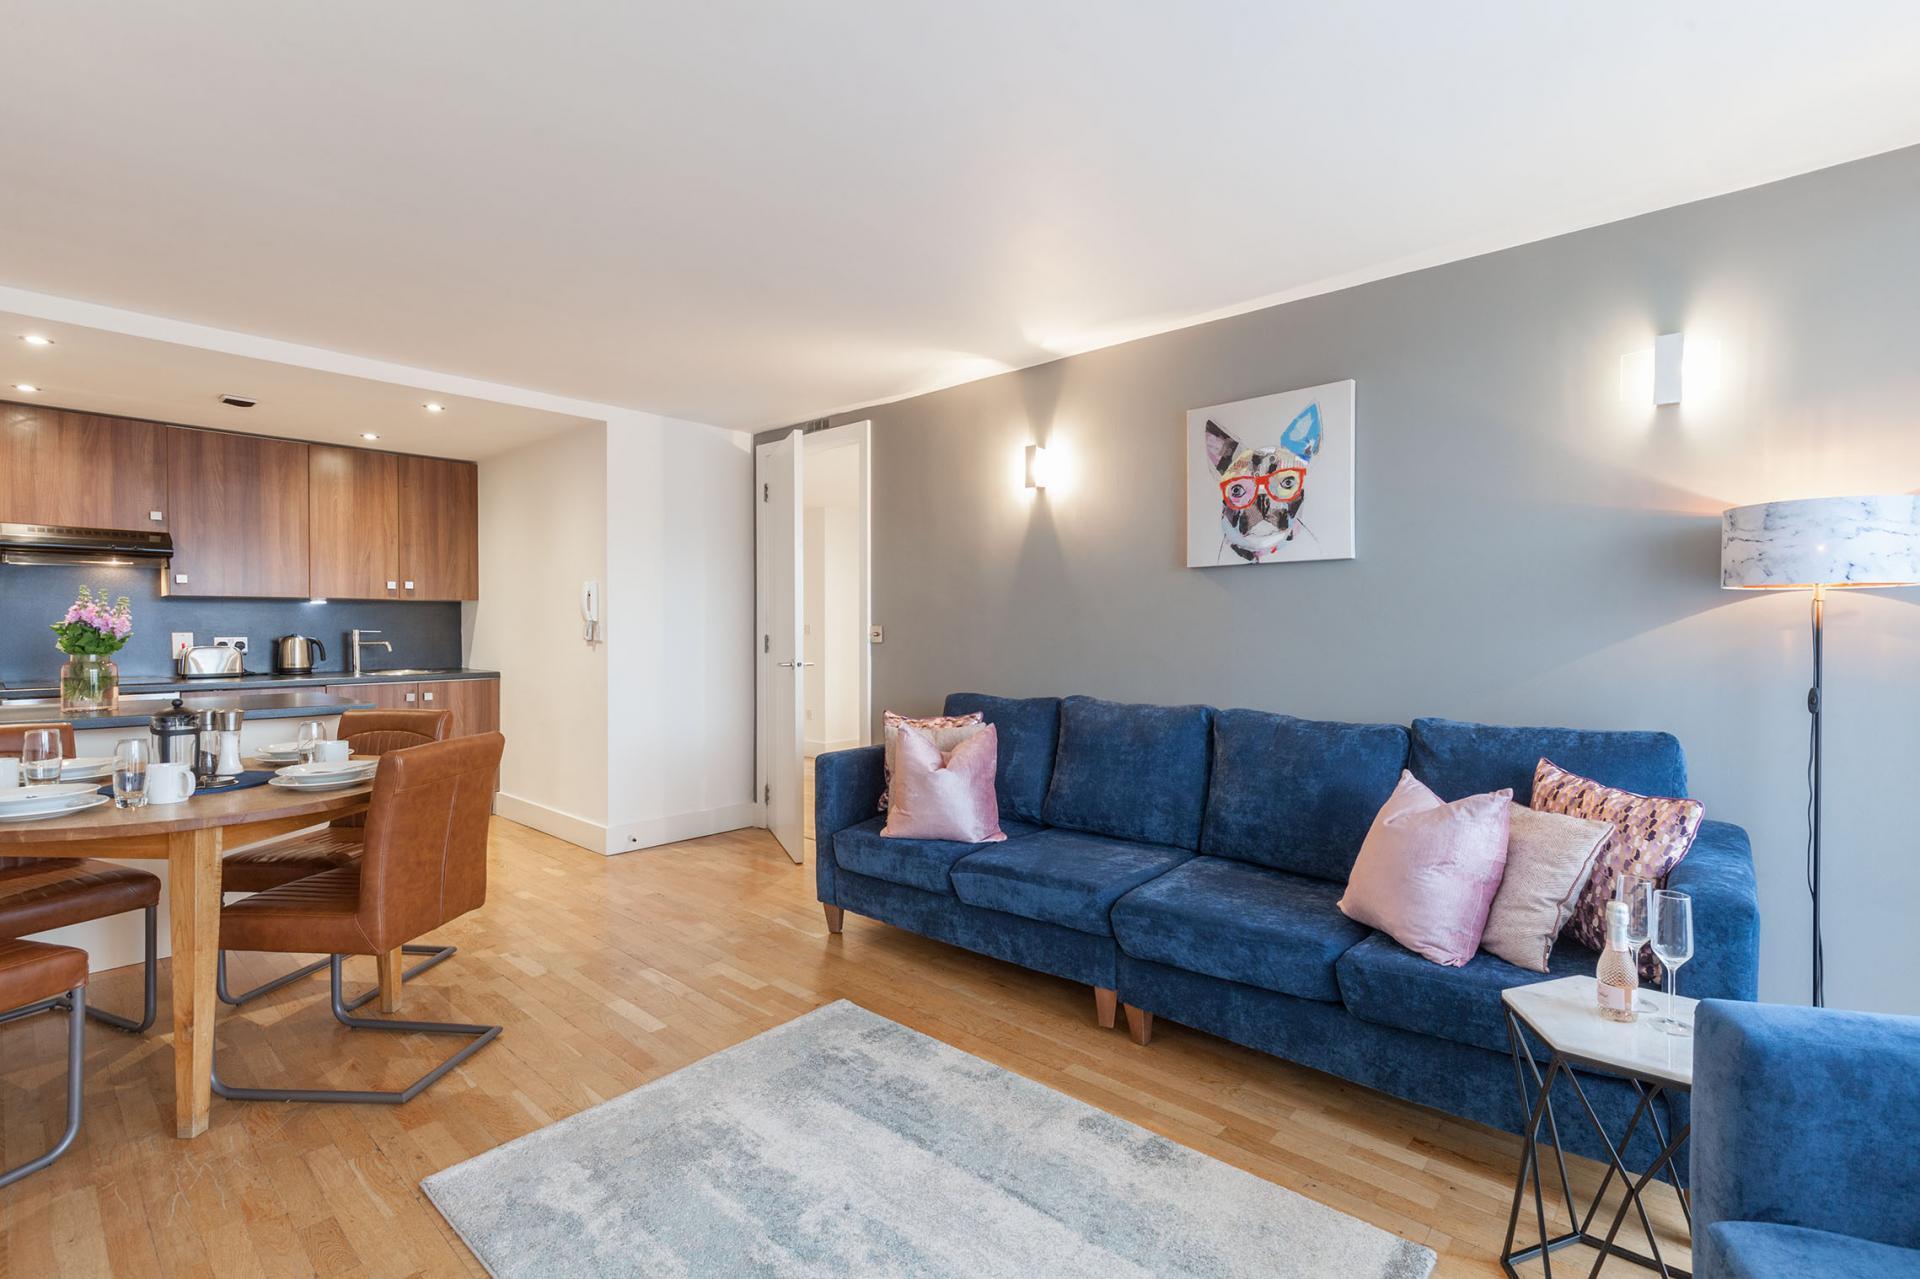 Blue sofa at Sinclair Apartments, Centre, Sheffield - Citybase Apartments